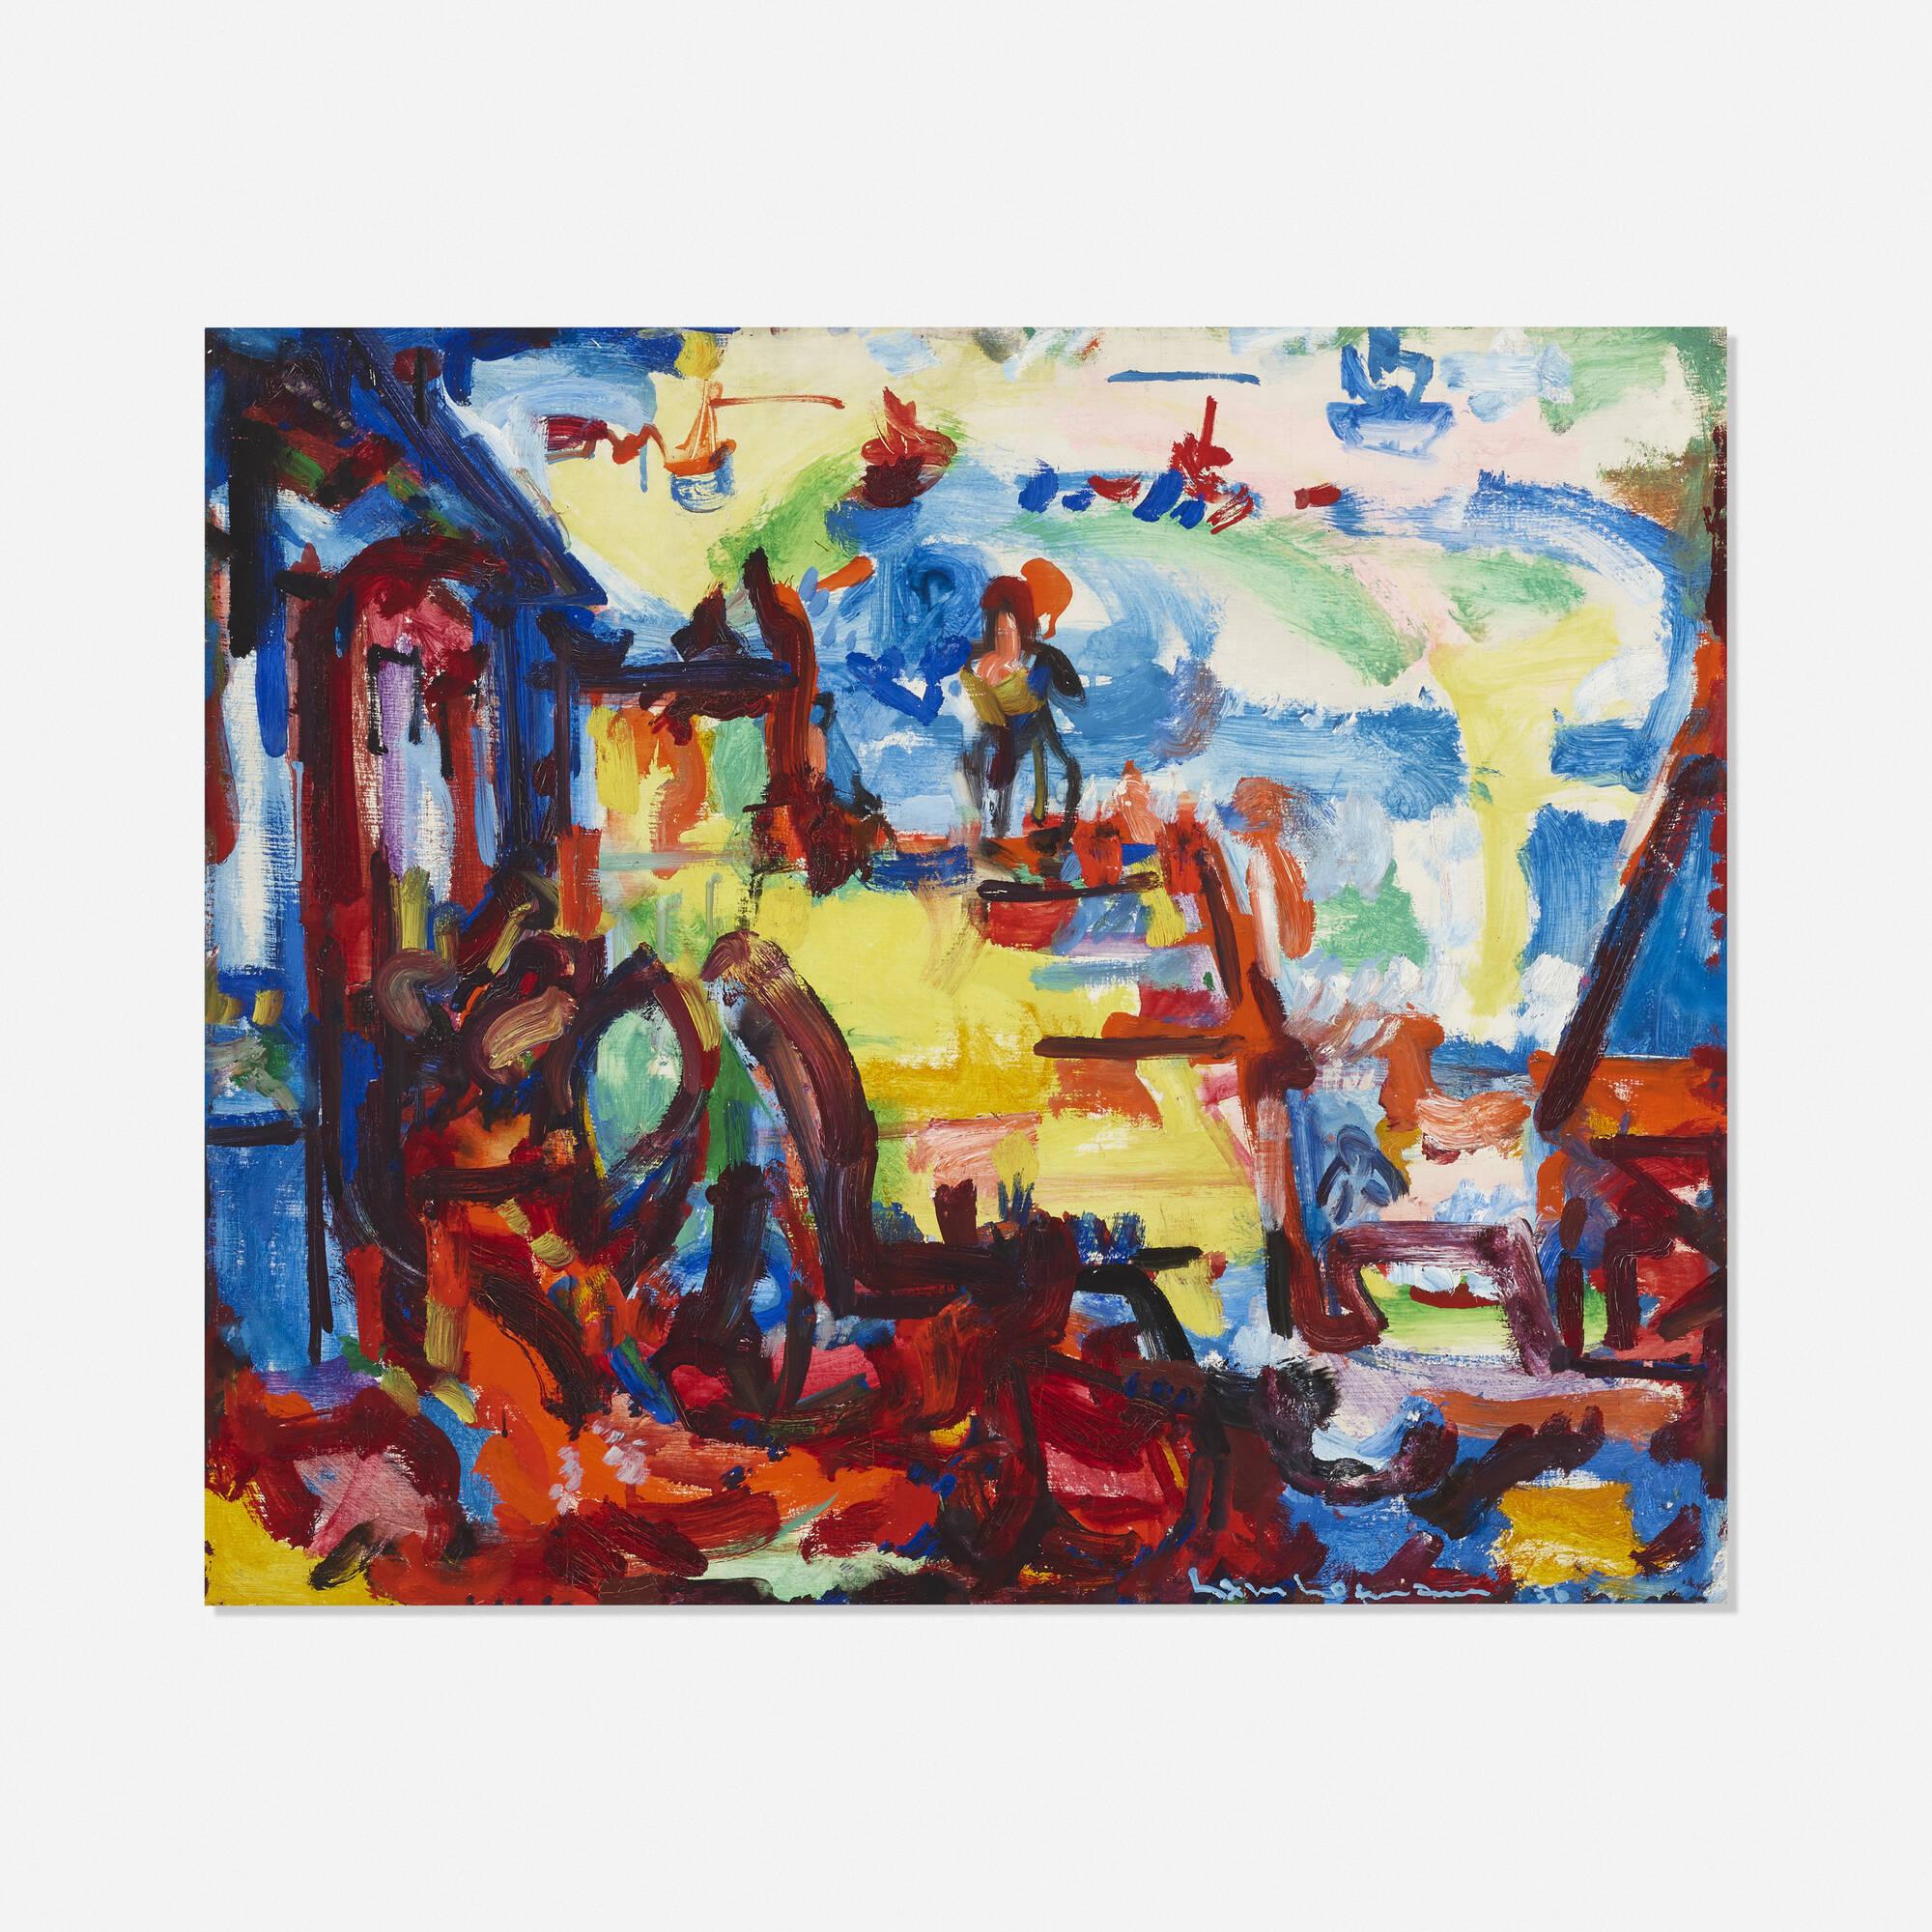 160: Hans Hofmann / On the Pier (1 of 1)